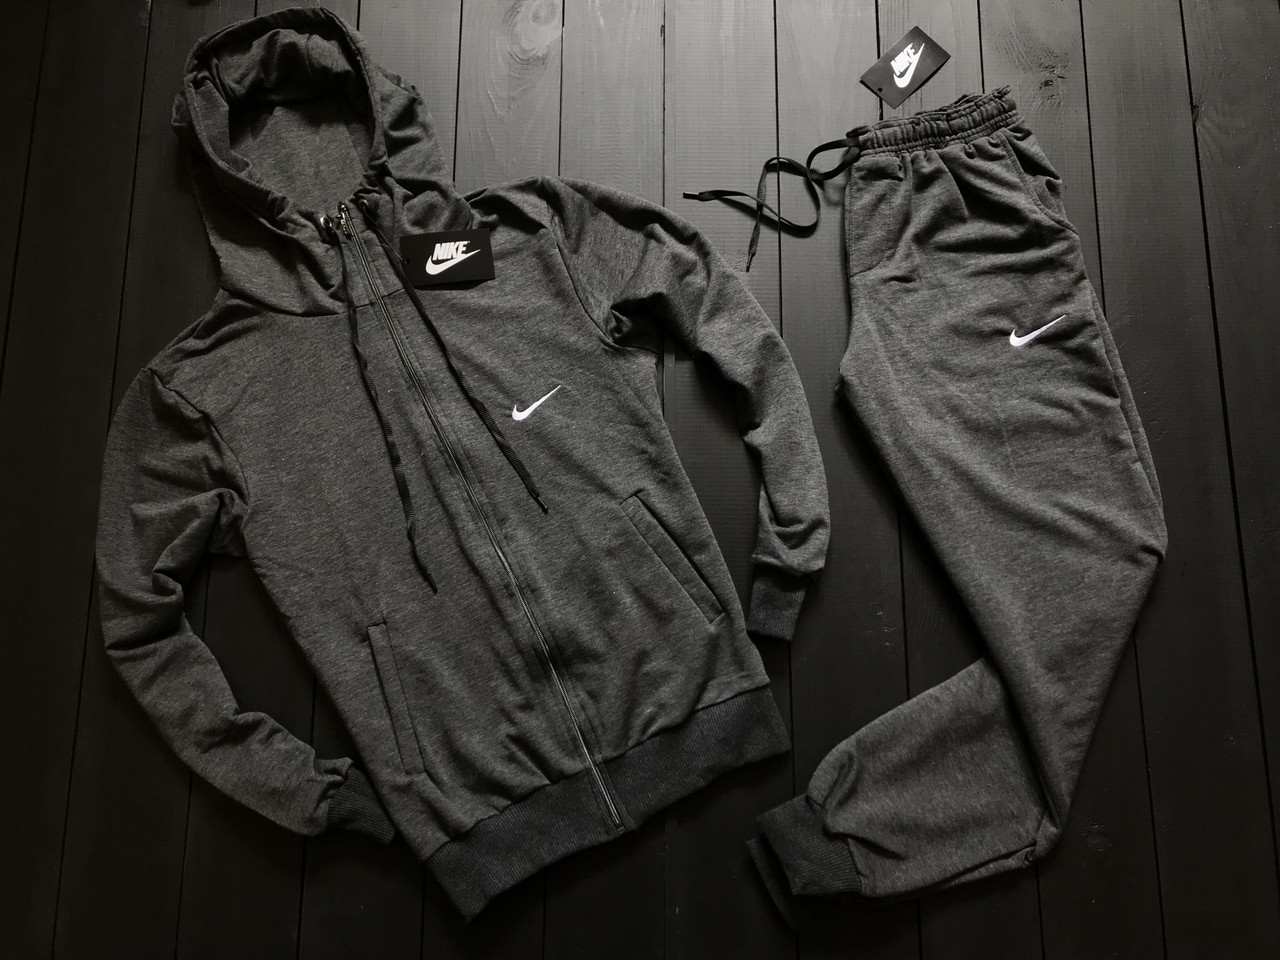 Мужской весенний спортивный костюм Nike (Gray), серый спортивный костюм, (Реплика ААА)